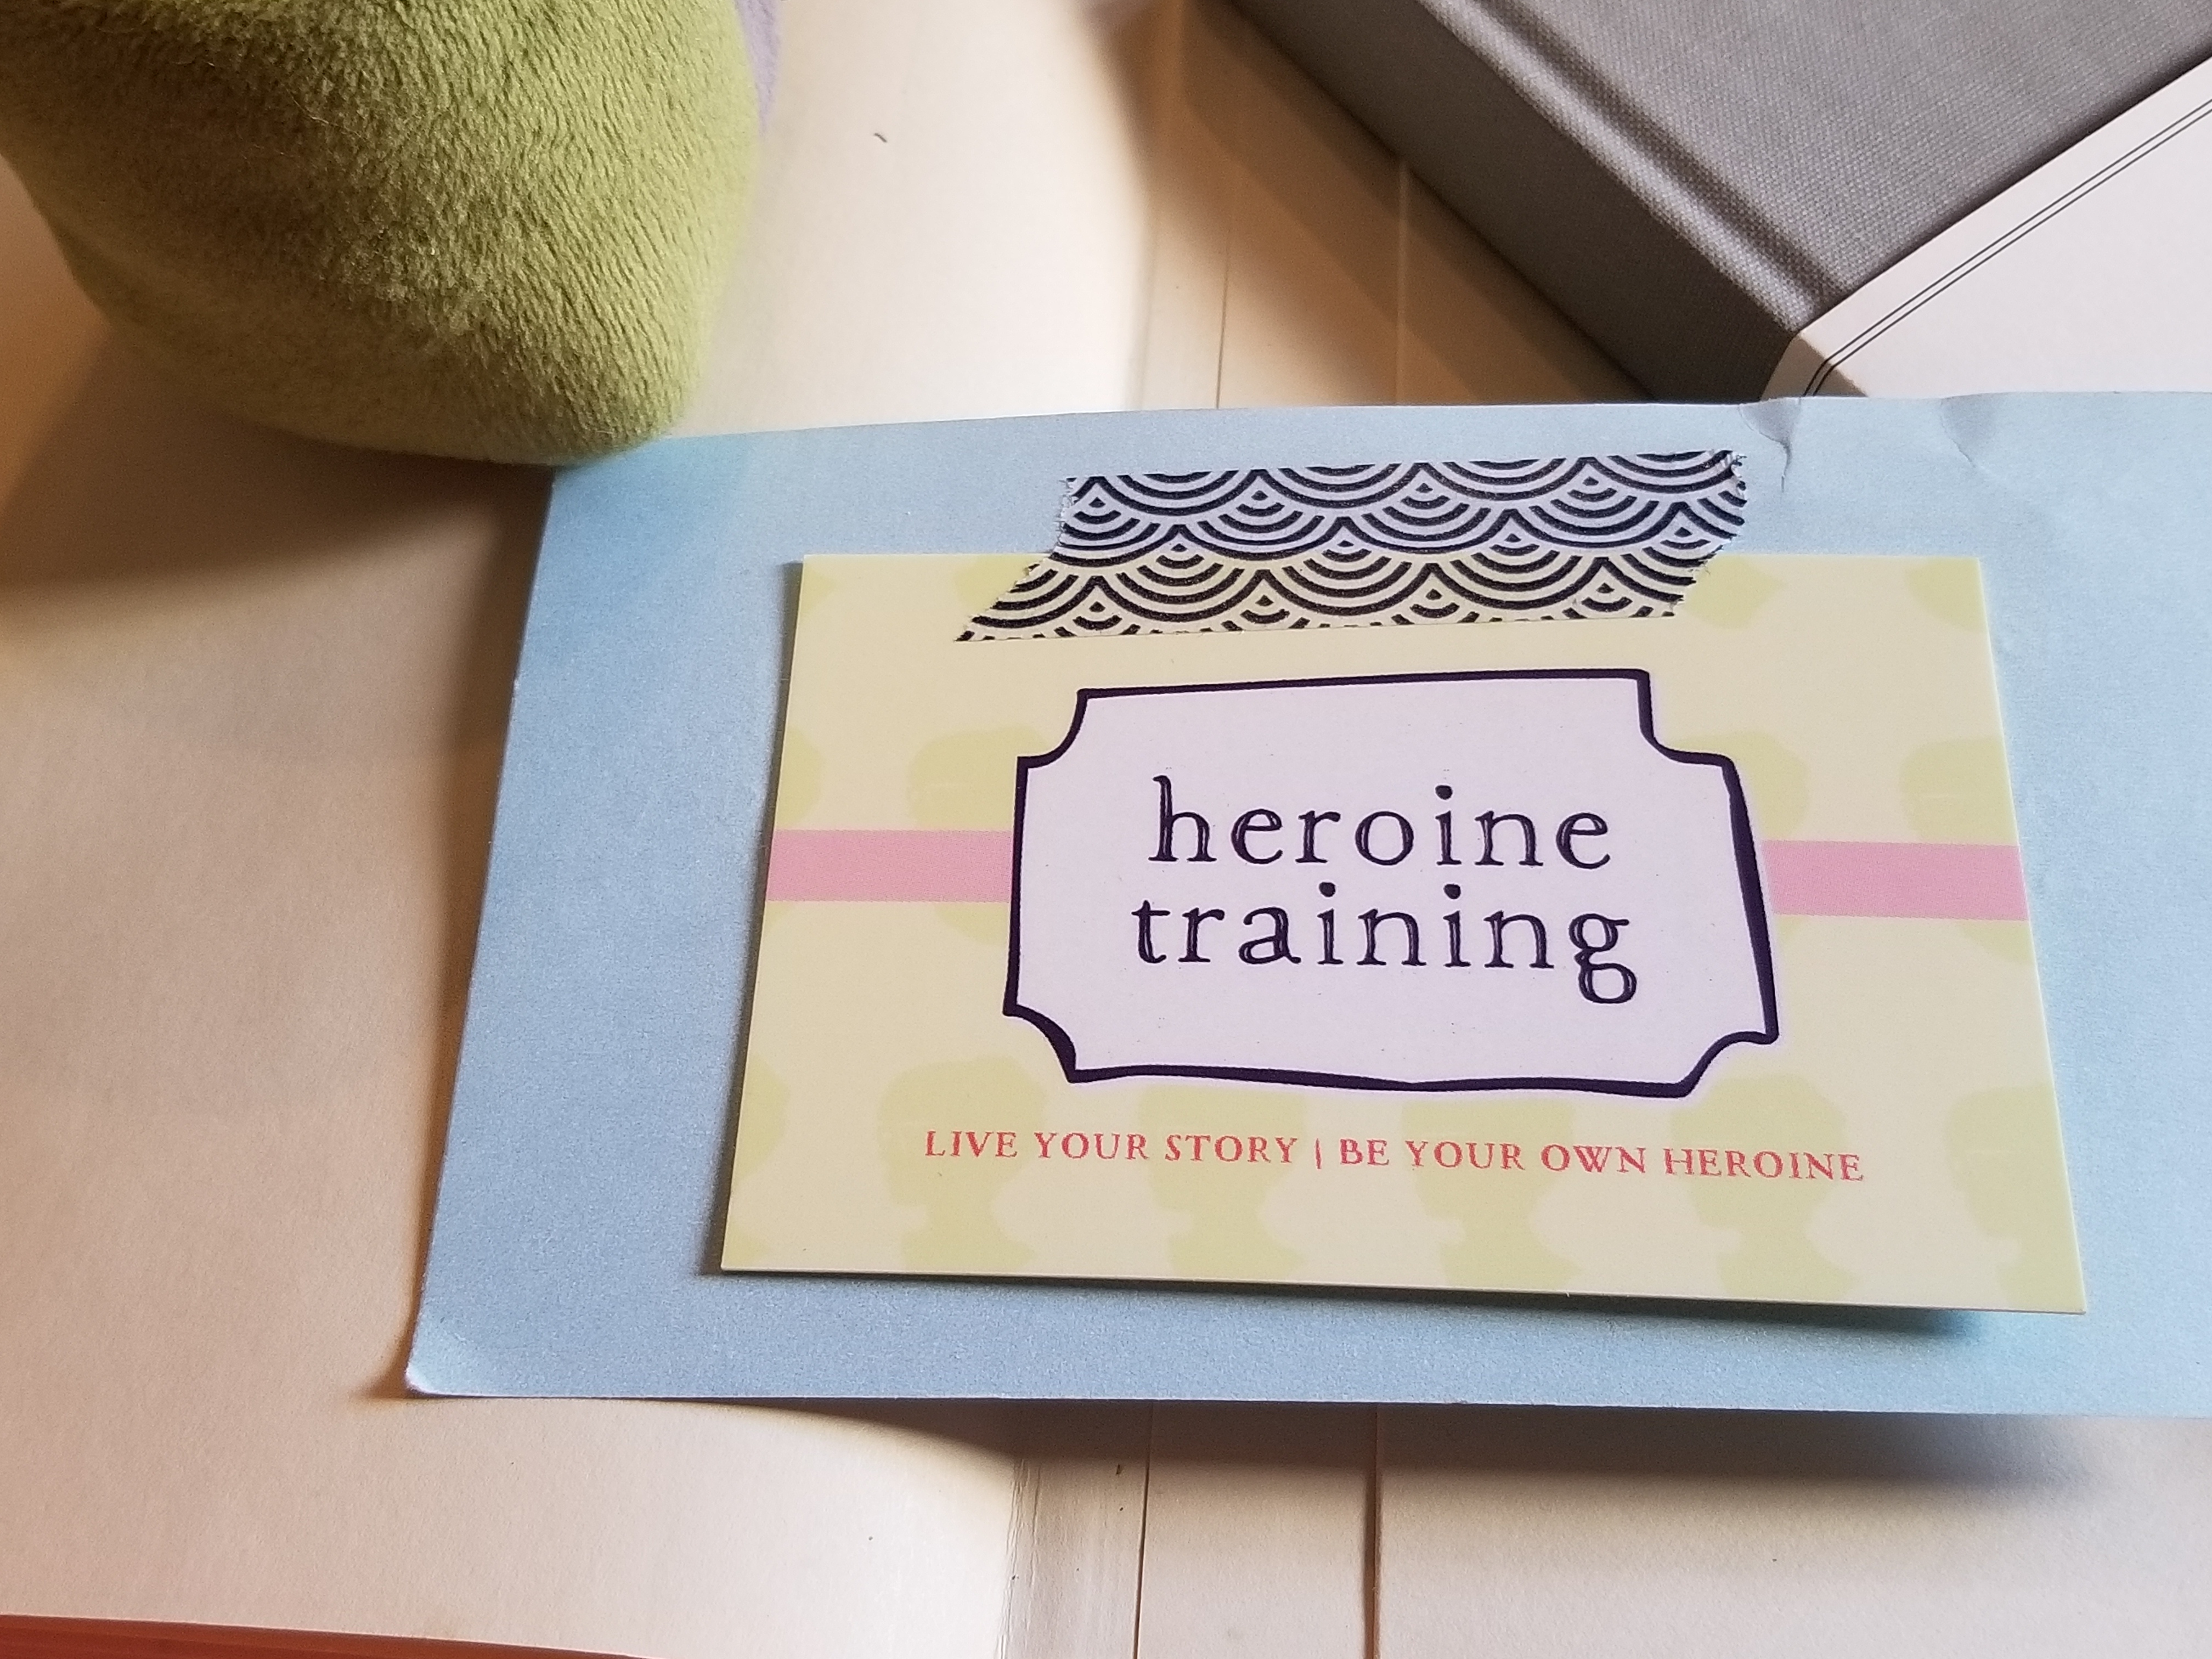 heroine training 2